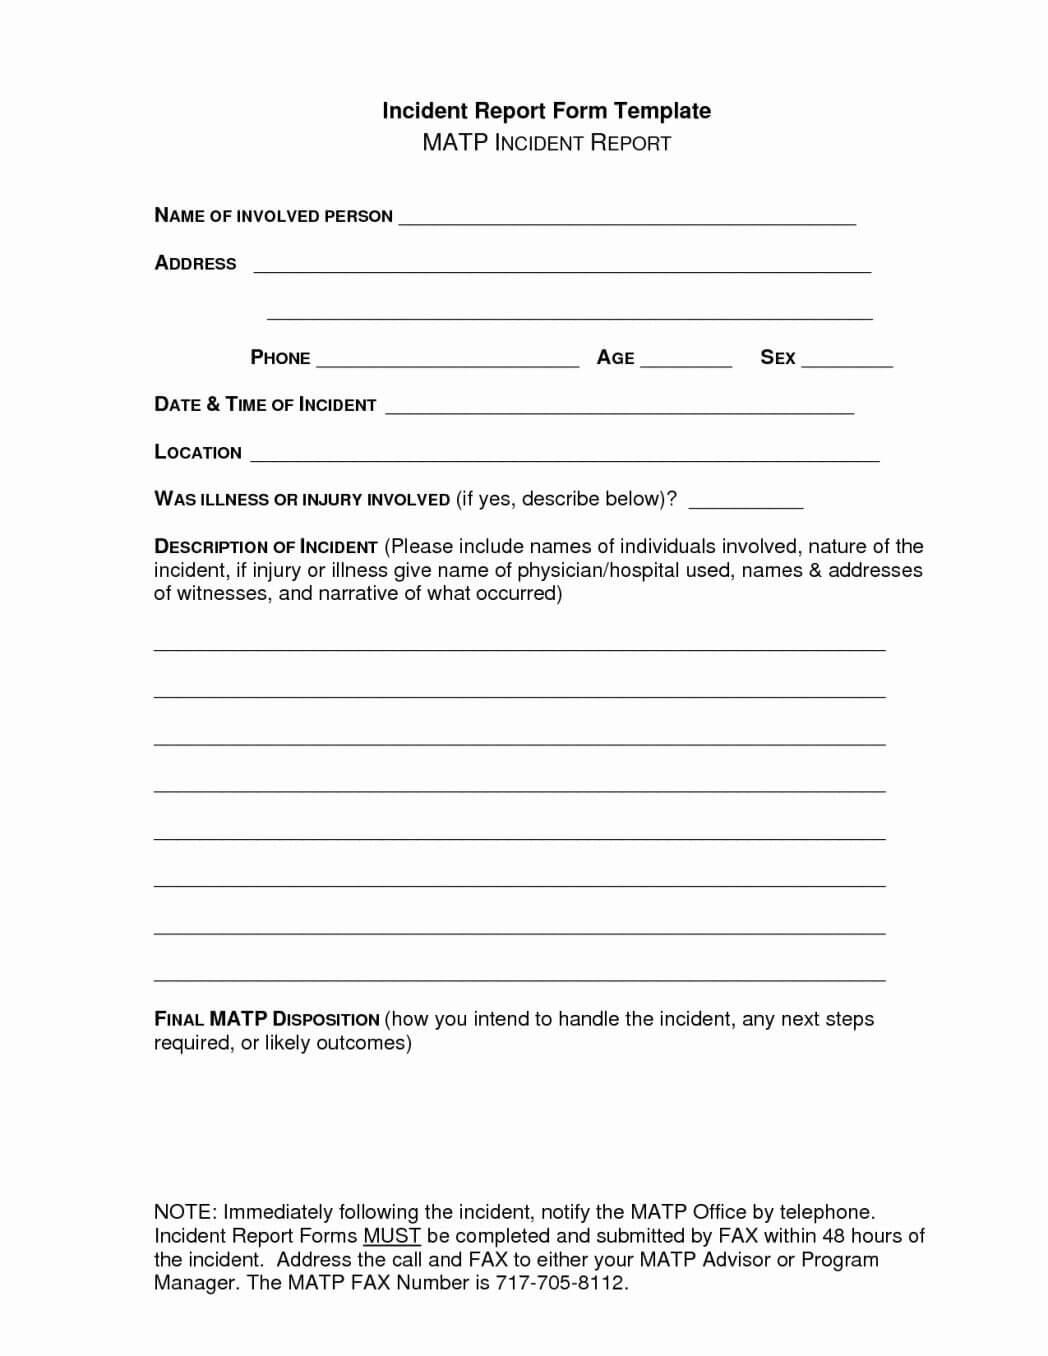 Incident Report Form Template ~ Adriennebailon inside Incident Report Form Template Qld